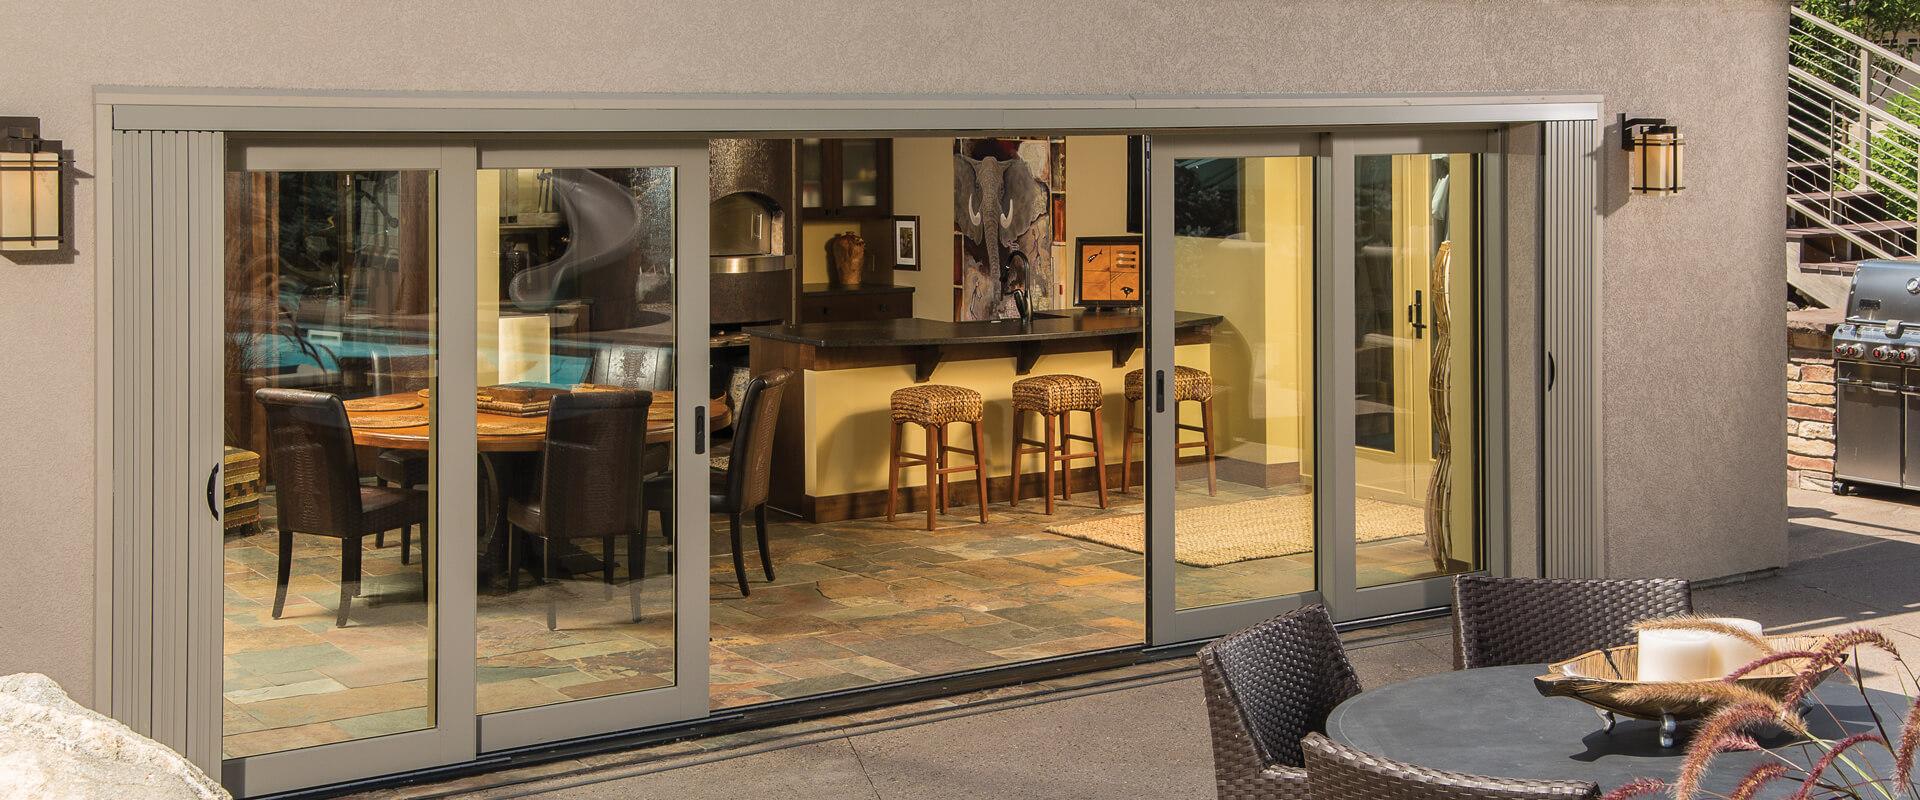 Ultra TerraSpan Lift \u0026 Slide Doors Exterior & Ultra Series Lift \u0026 Slide Doors | Kolbe Windows \u0026 Doors